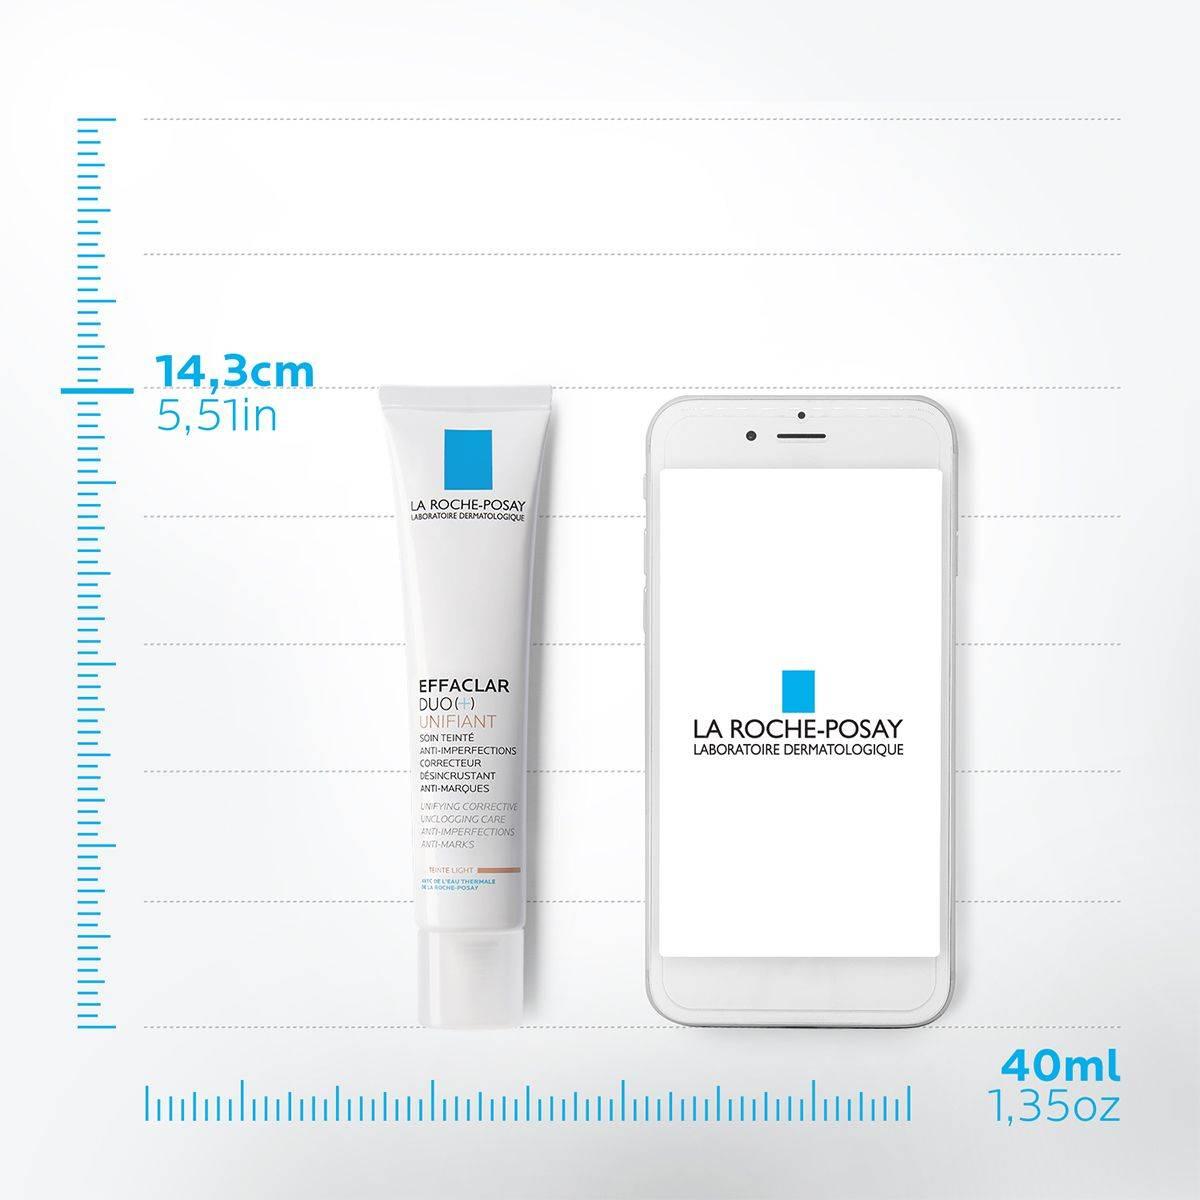 La Roche Posay Kasvojenhoito Effaclar Duo plus Unifiant Light 40ml 3337875